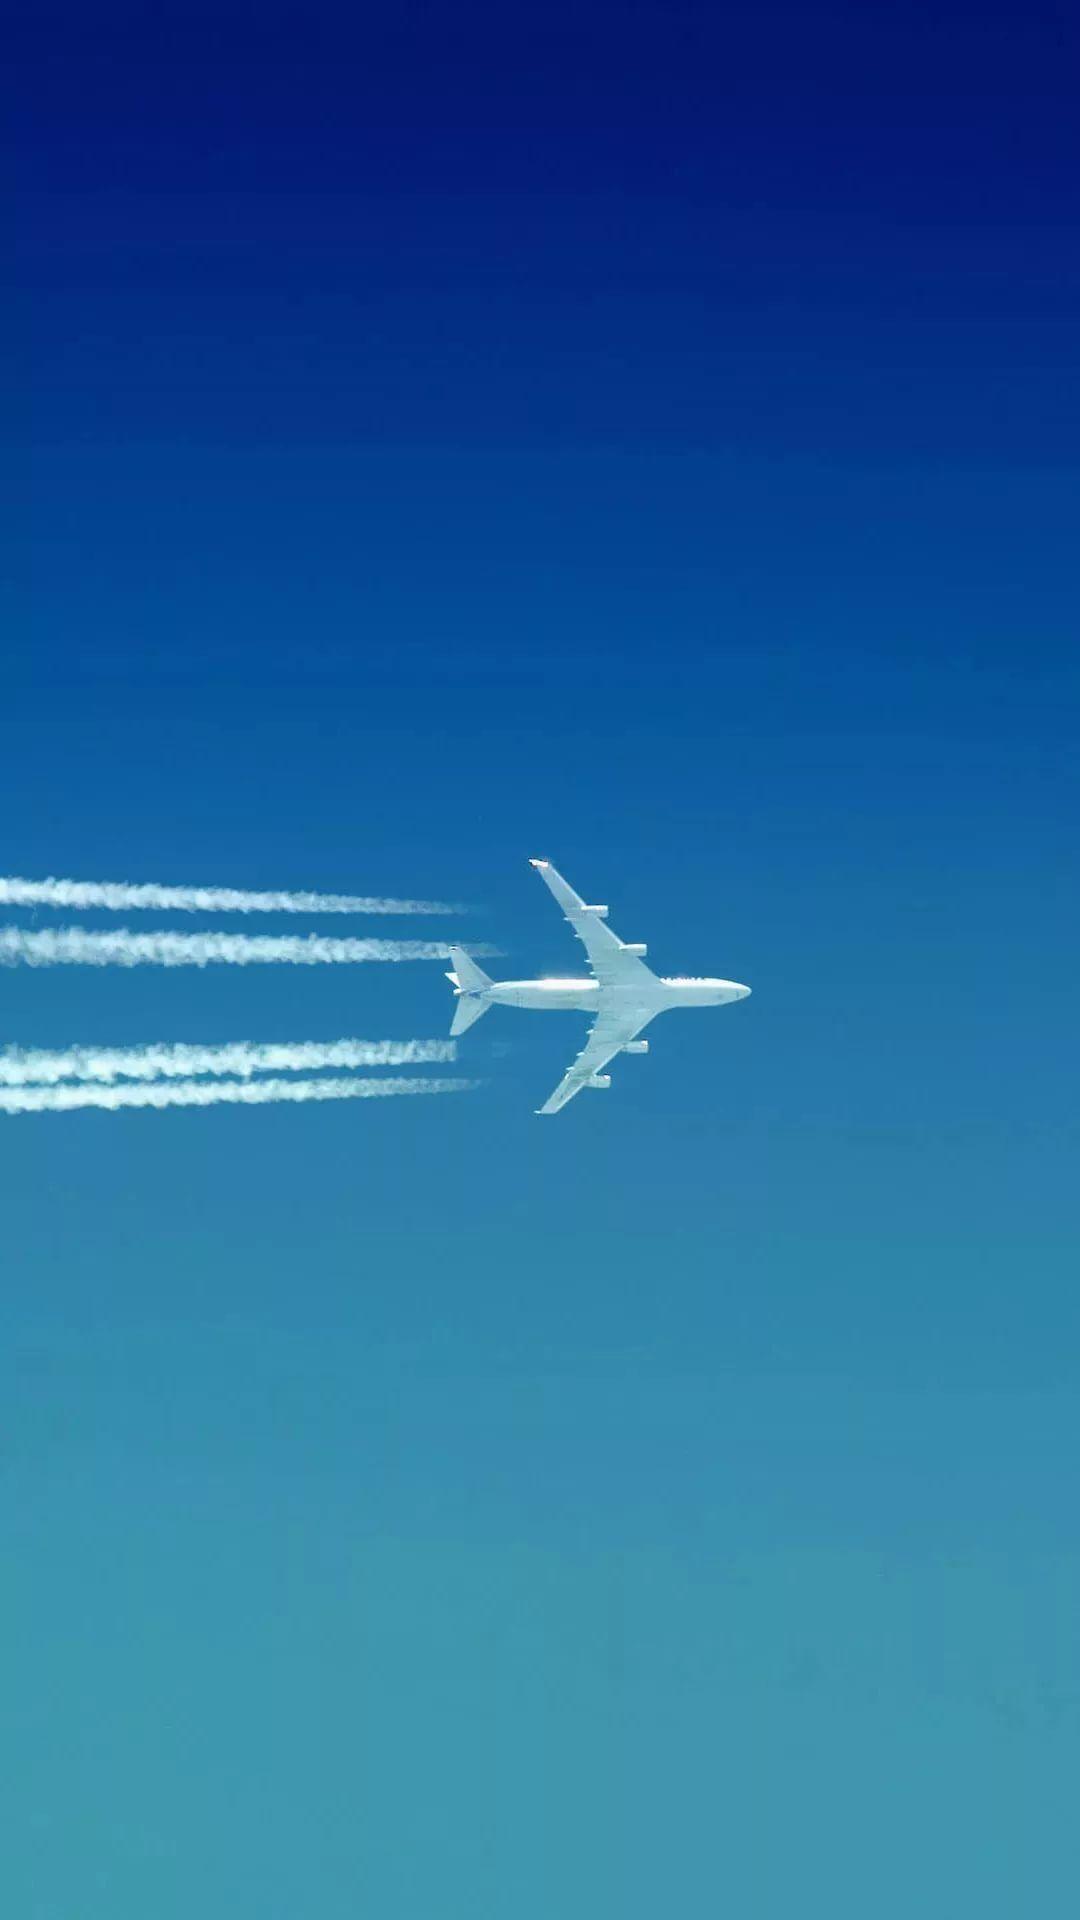 Airplane Apple wallpaper HD